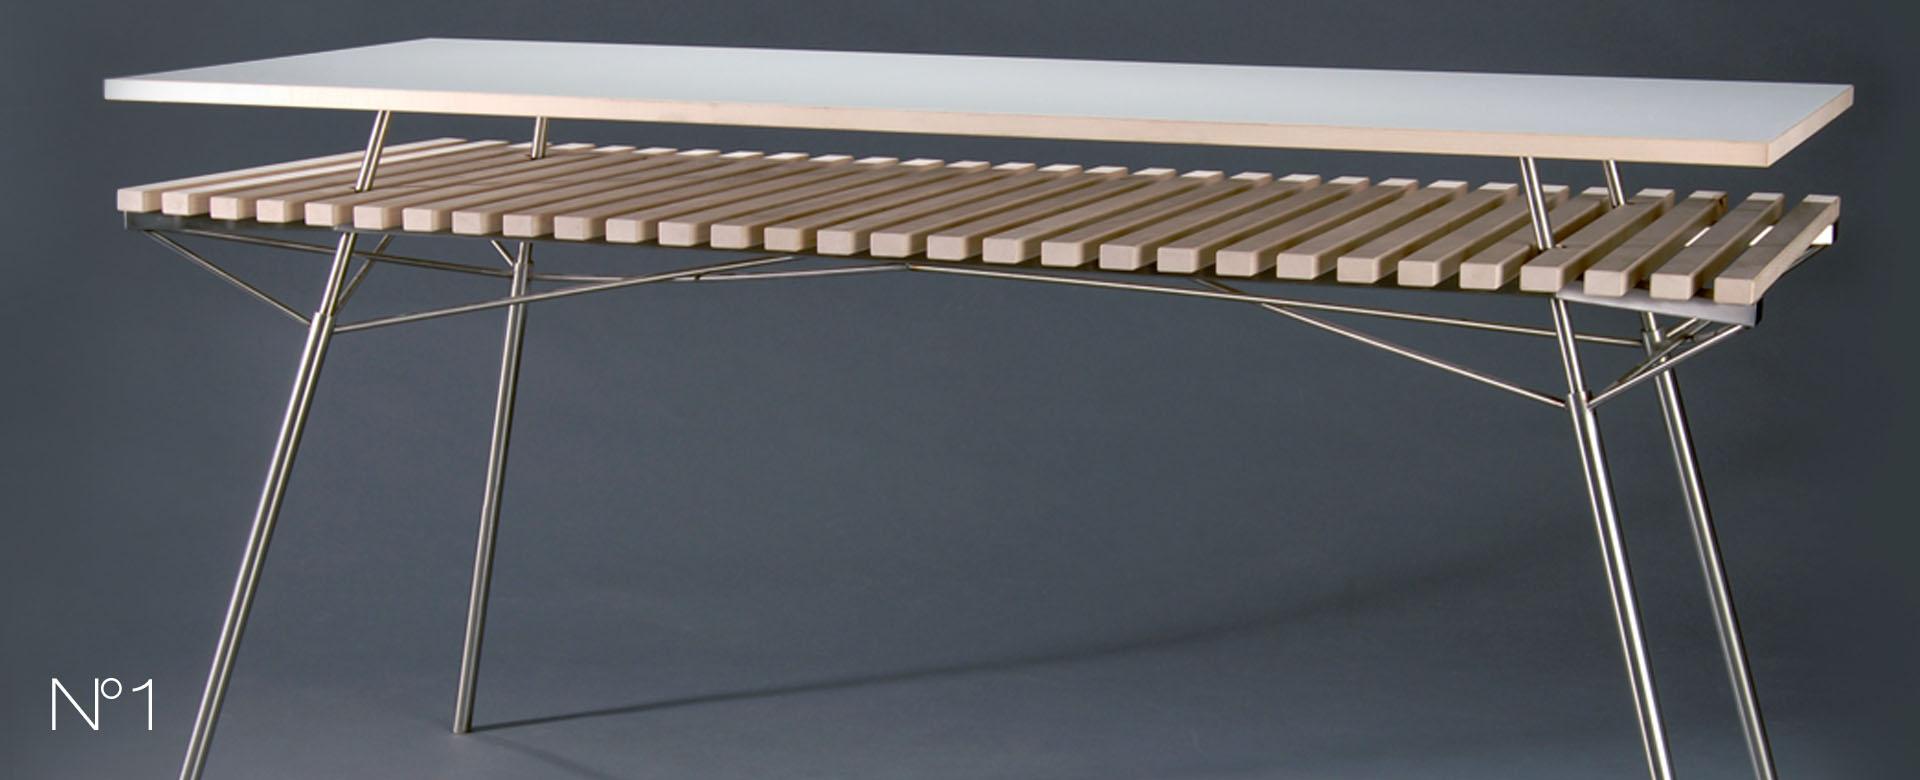 Florian Mack - Industrial Design